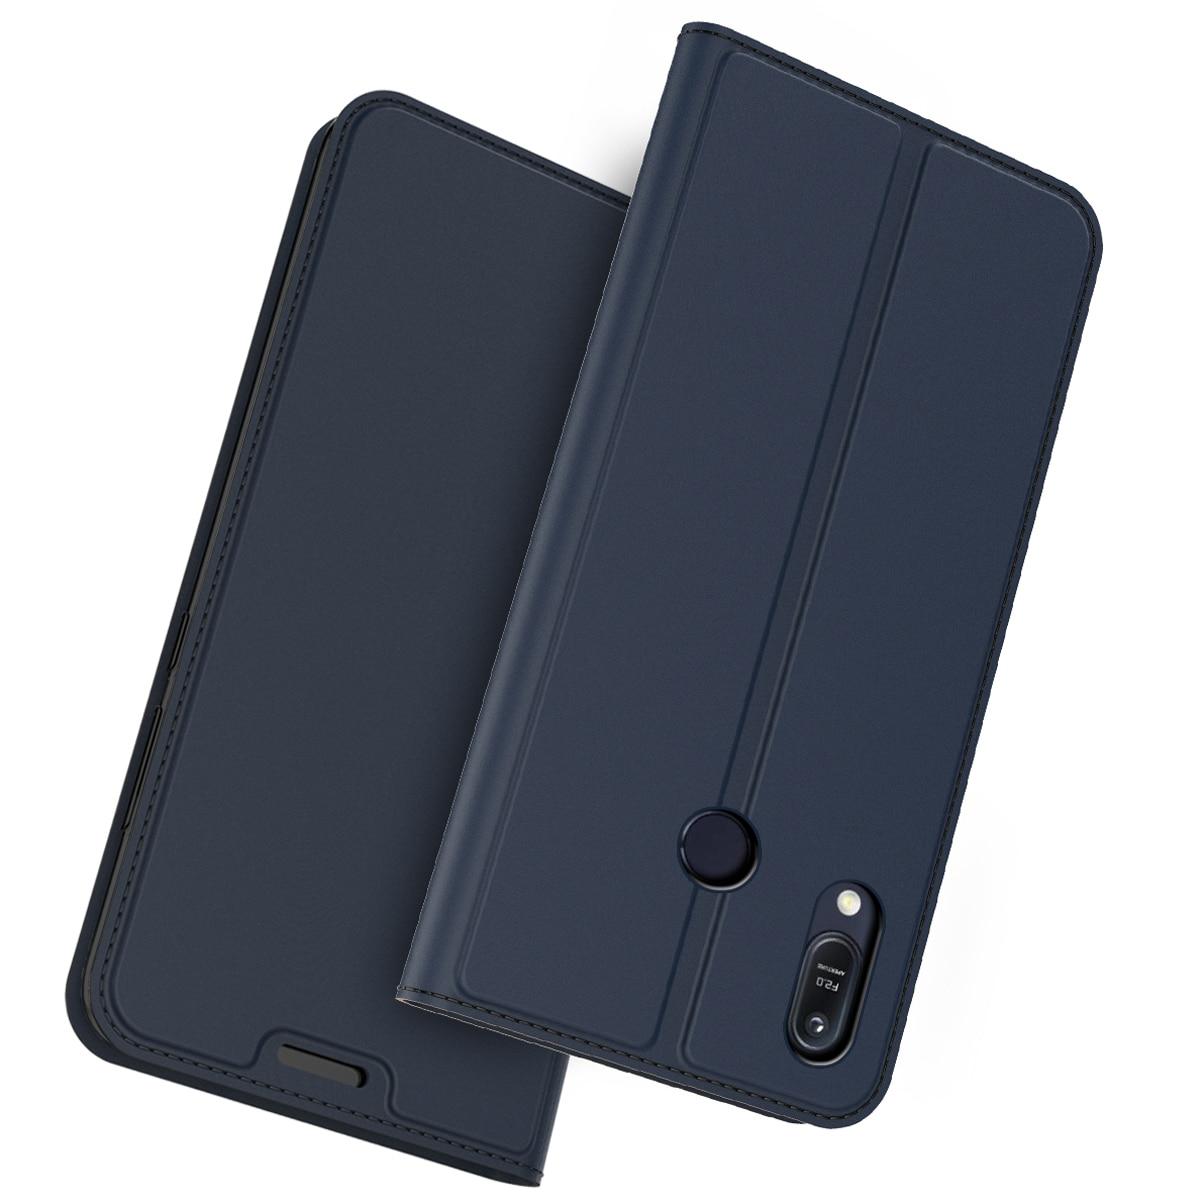 For Asus Zenfone Max Pro M2 ZB631KL Case PU Leather Flip Stand Wallet Cover For Asus ZB631KL ZB633KL ZB602KL Case Card Holder